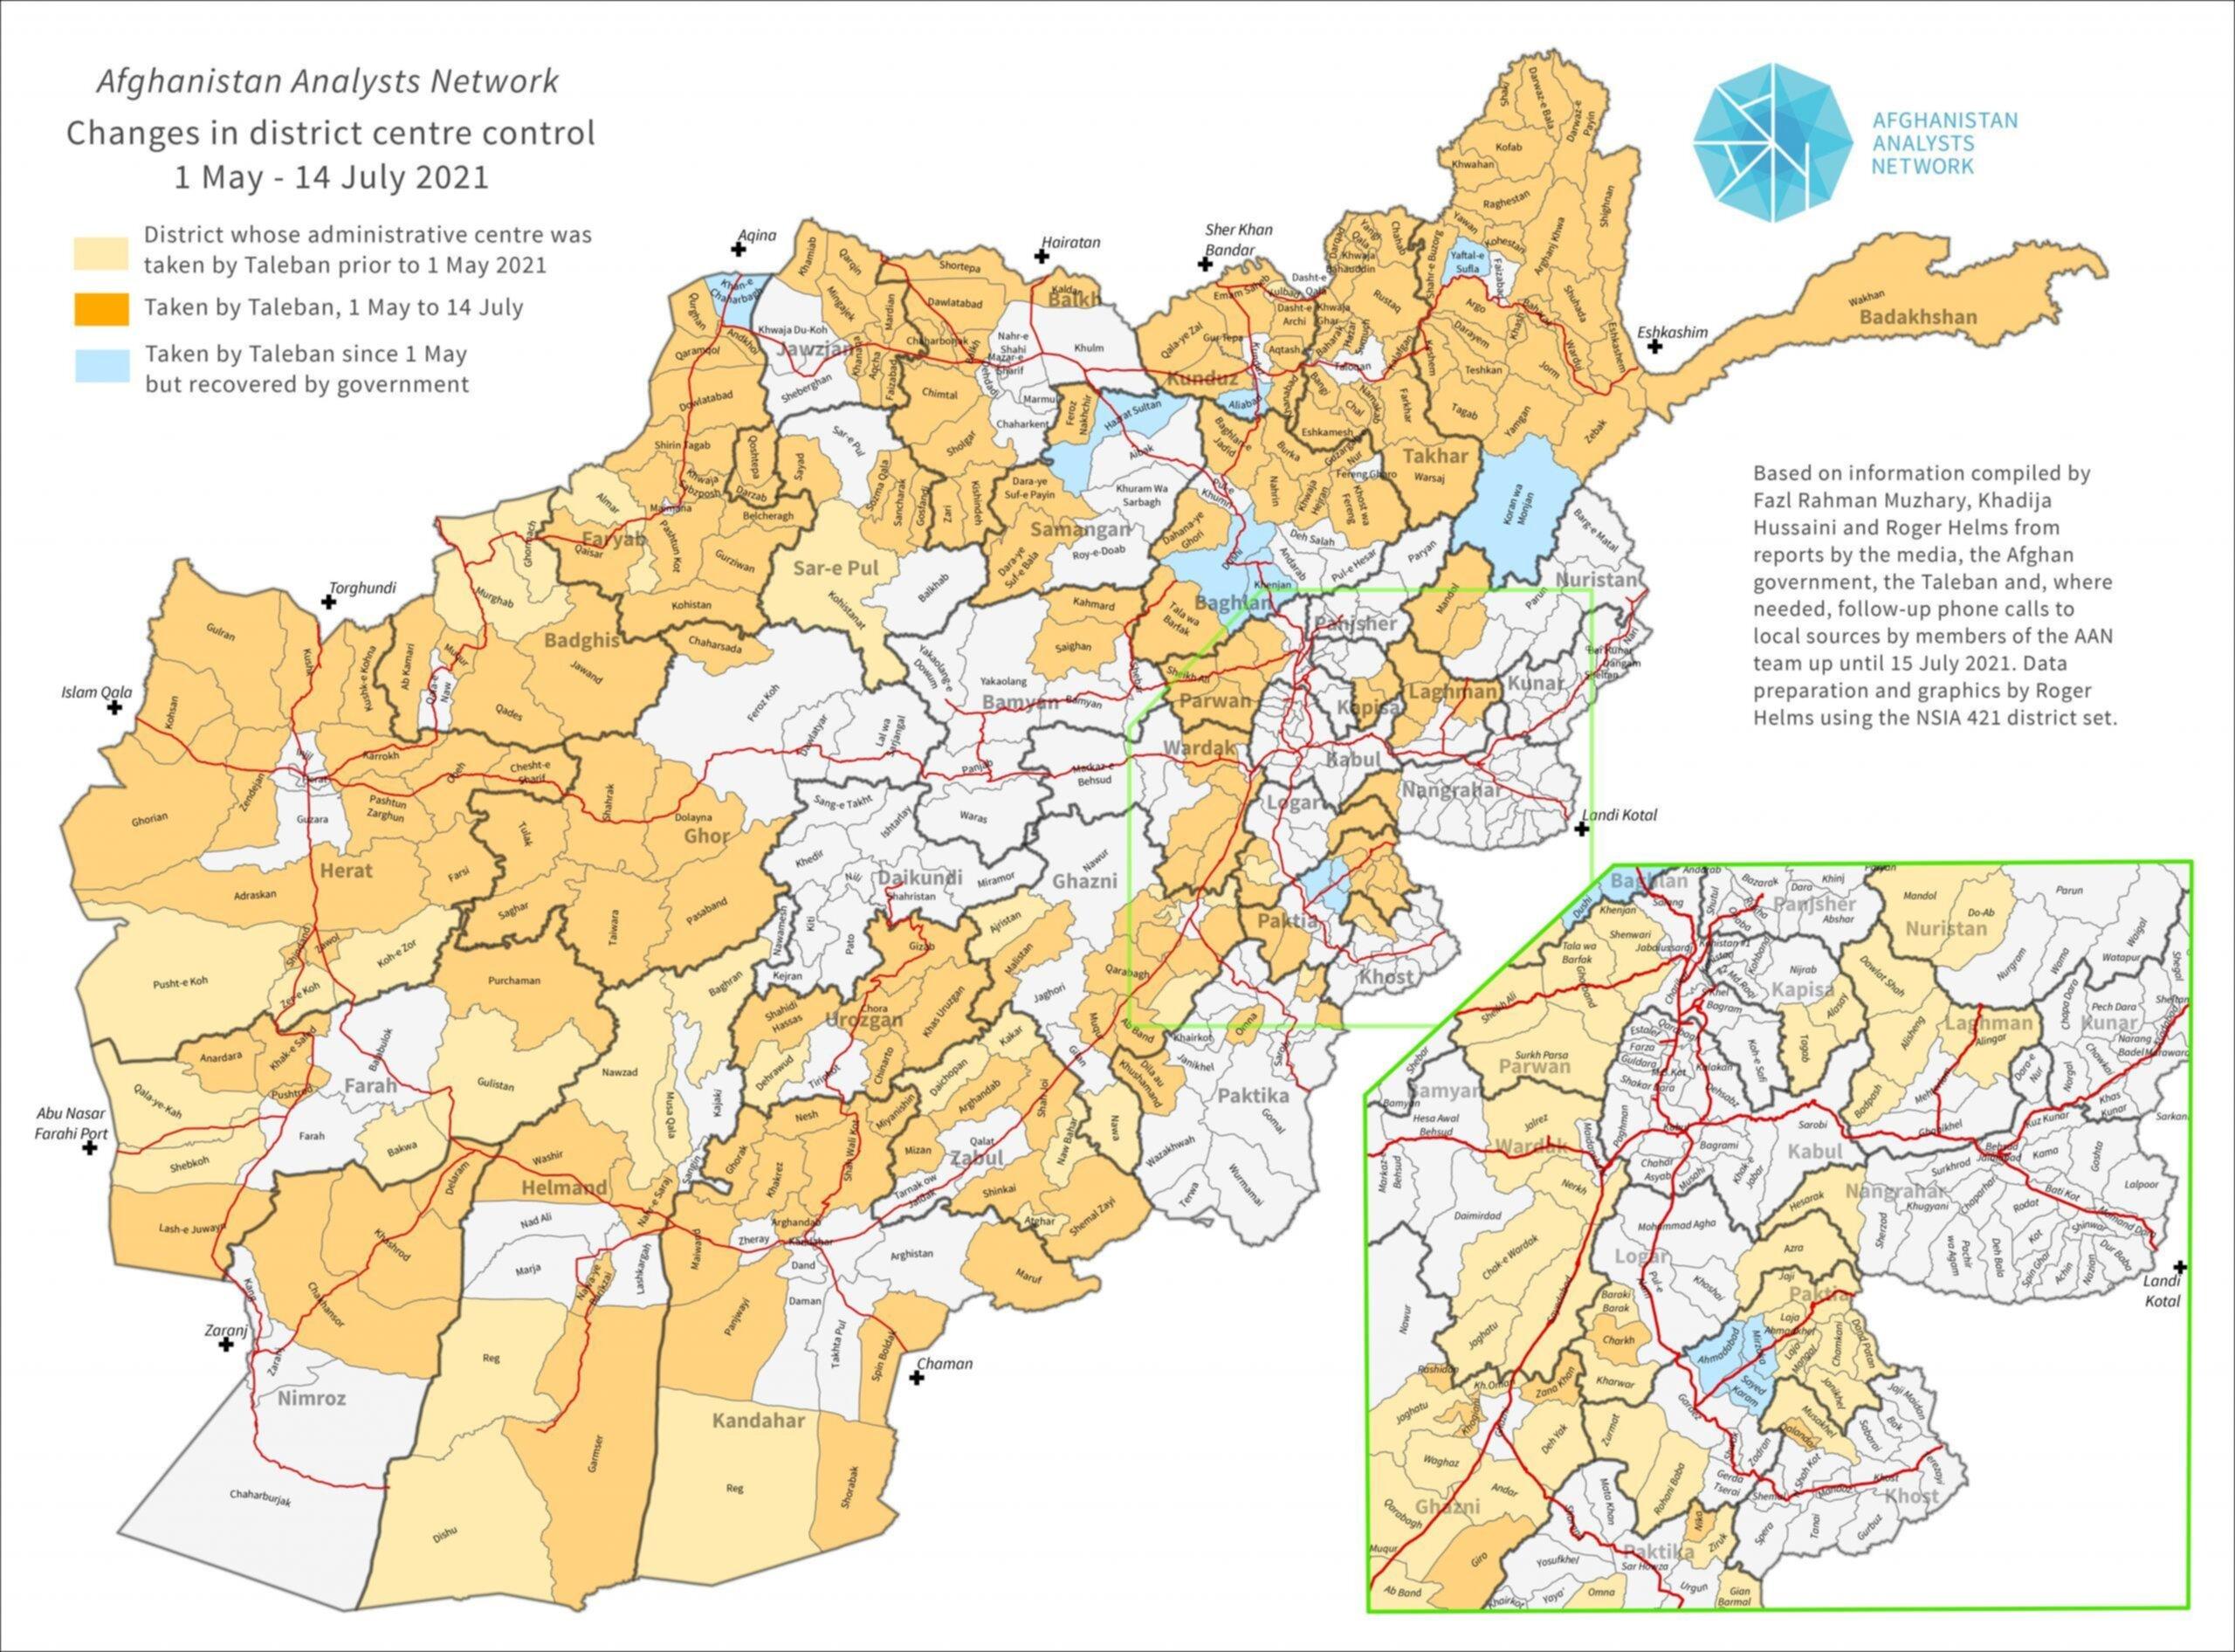 Distretti afgani contesi tra Talebani e governo di Kabul - luglio 2021